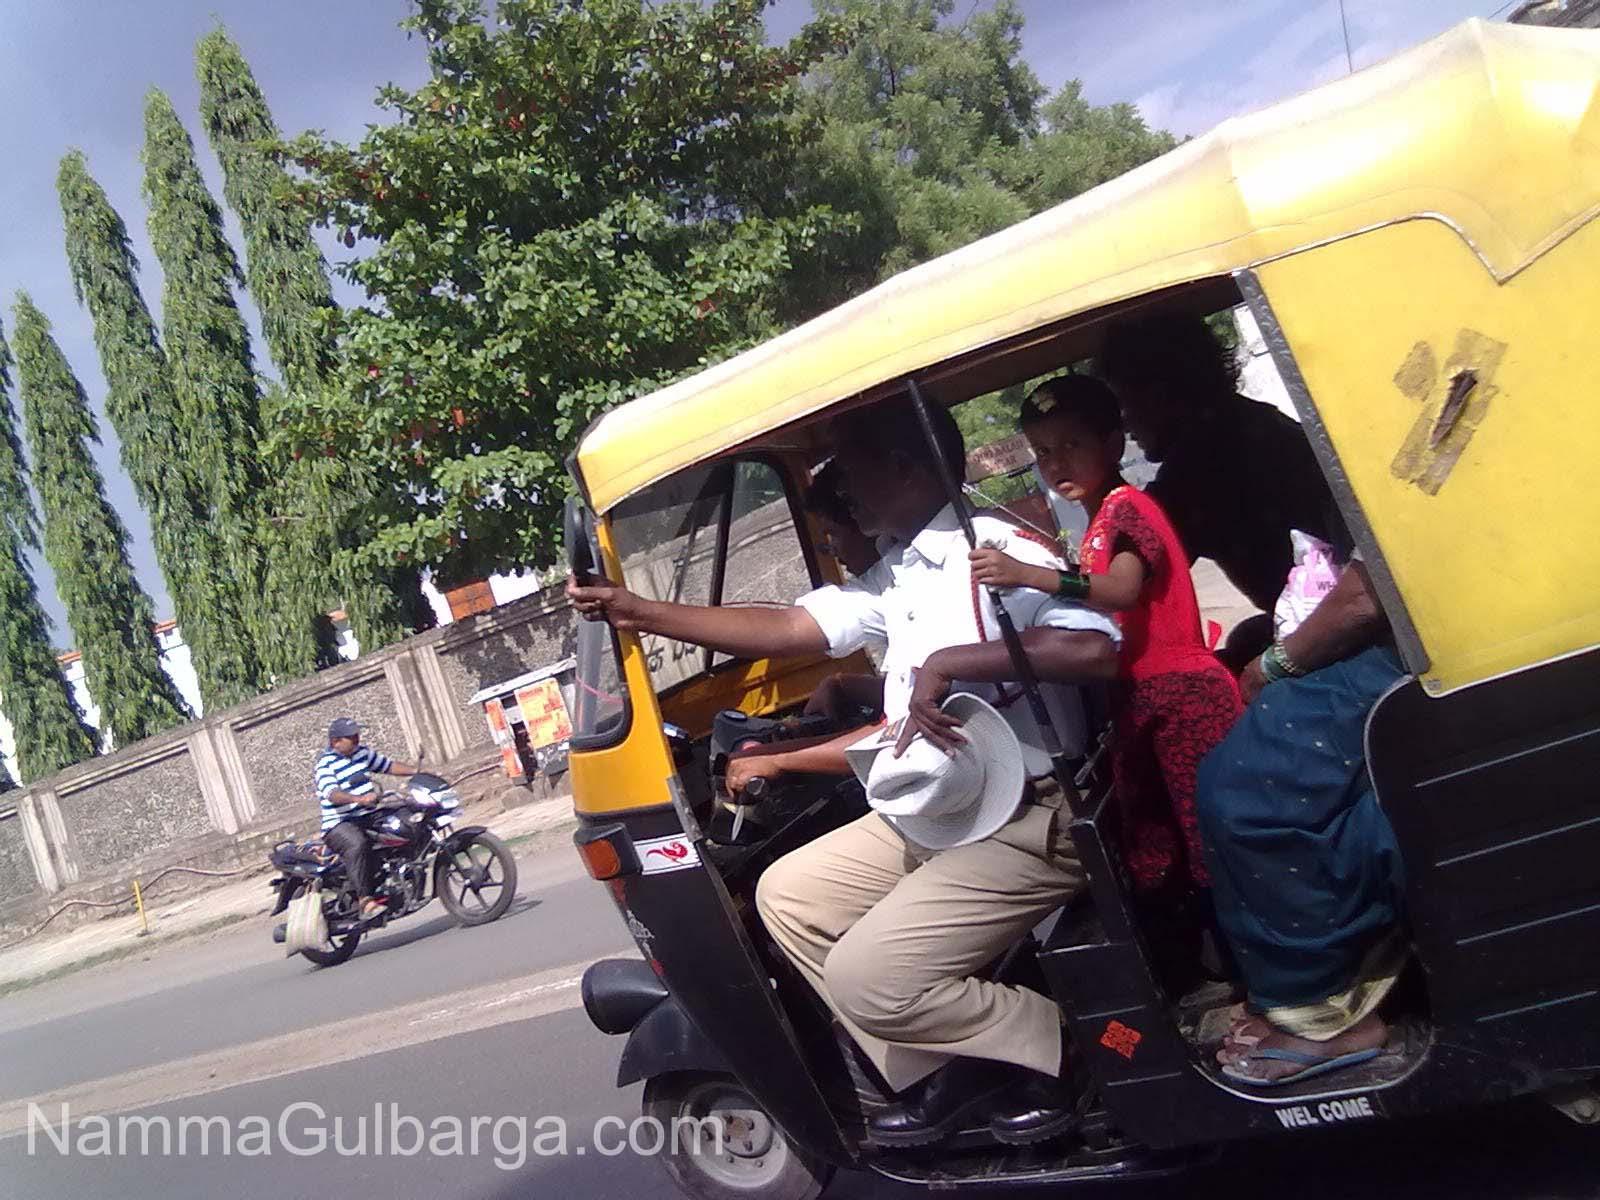 Gulbarga police gulbarga goverment